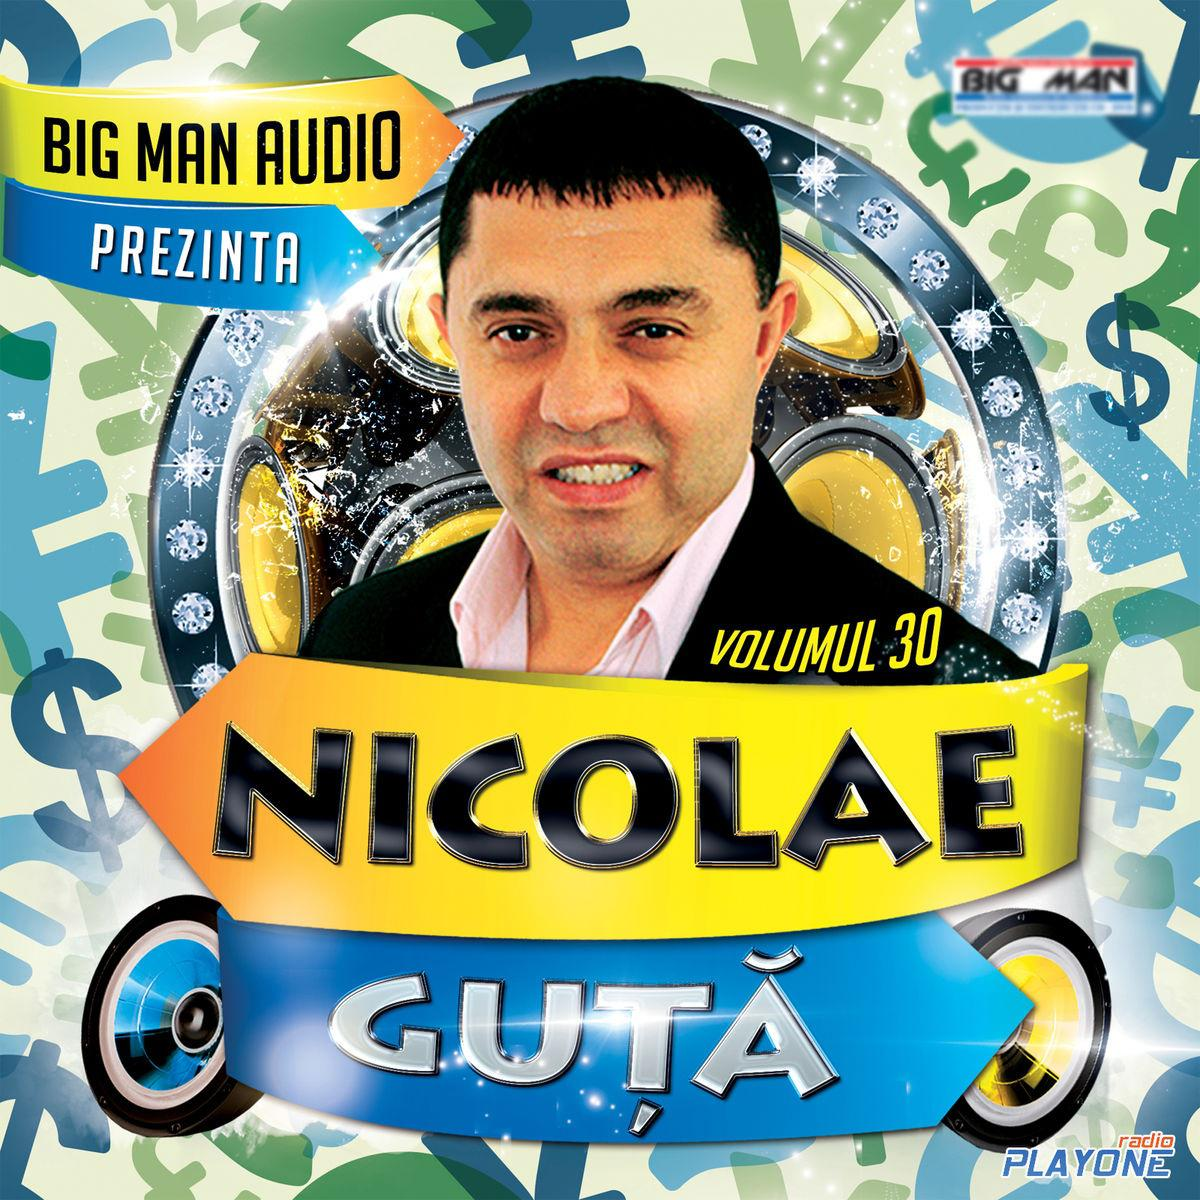 Download nicolae guta vol 30 2013 zippy